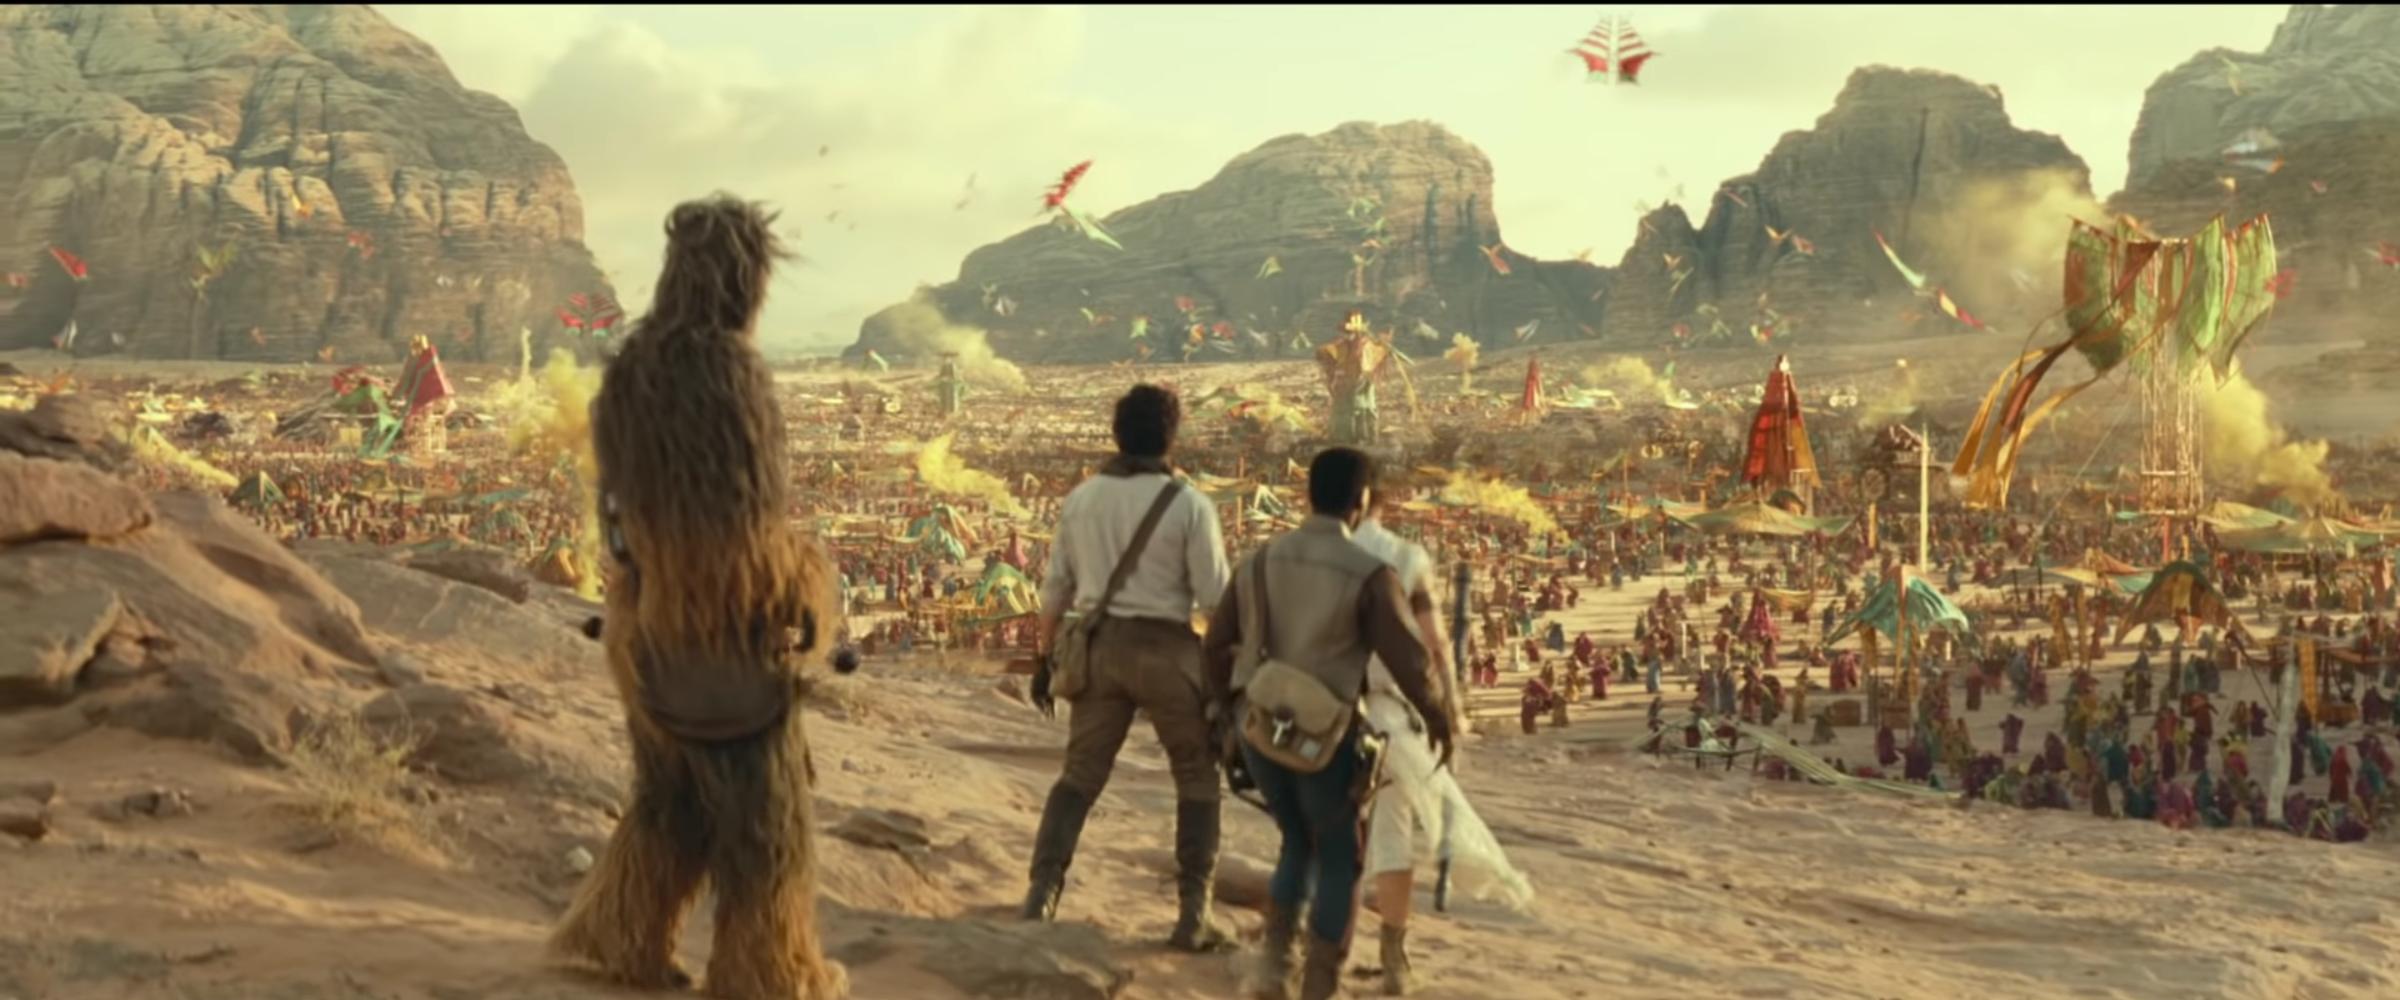 Star Wars 9 Footage Breakdown Dark Rey Leia And More Collider